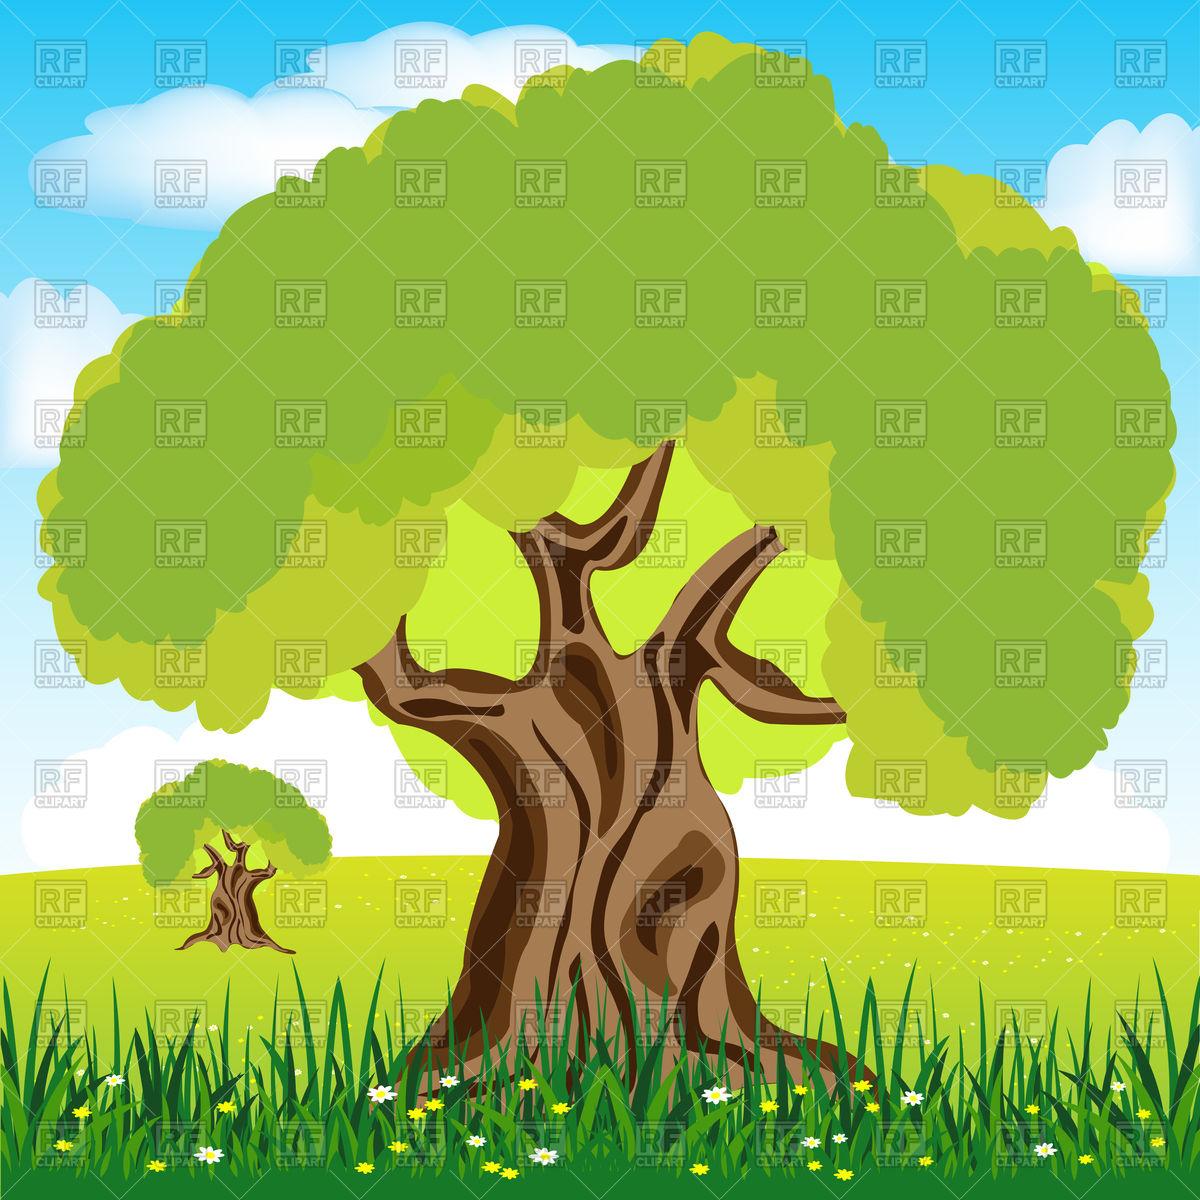 Big tree oak on glade Vector Image #91401.